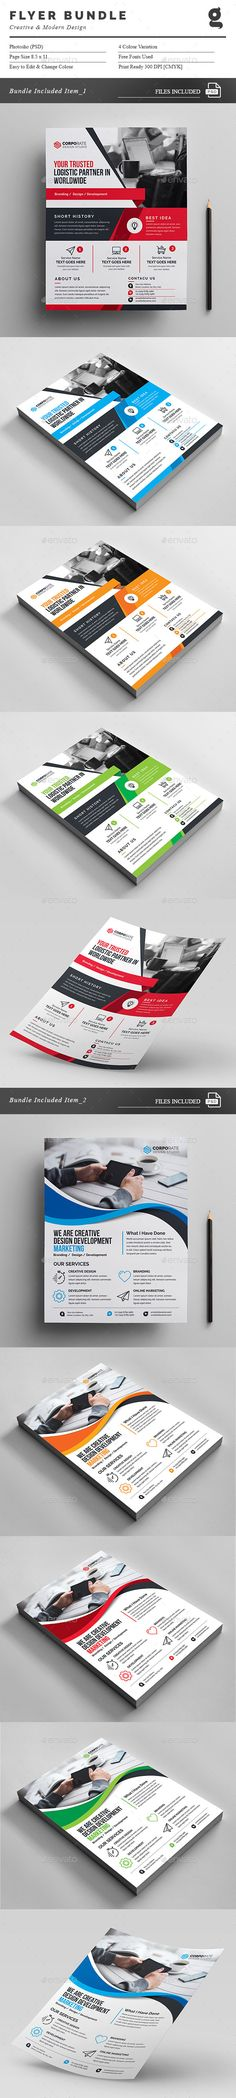 Flyer Bundle Template PSD